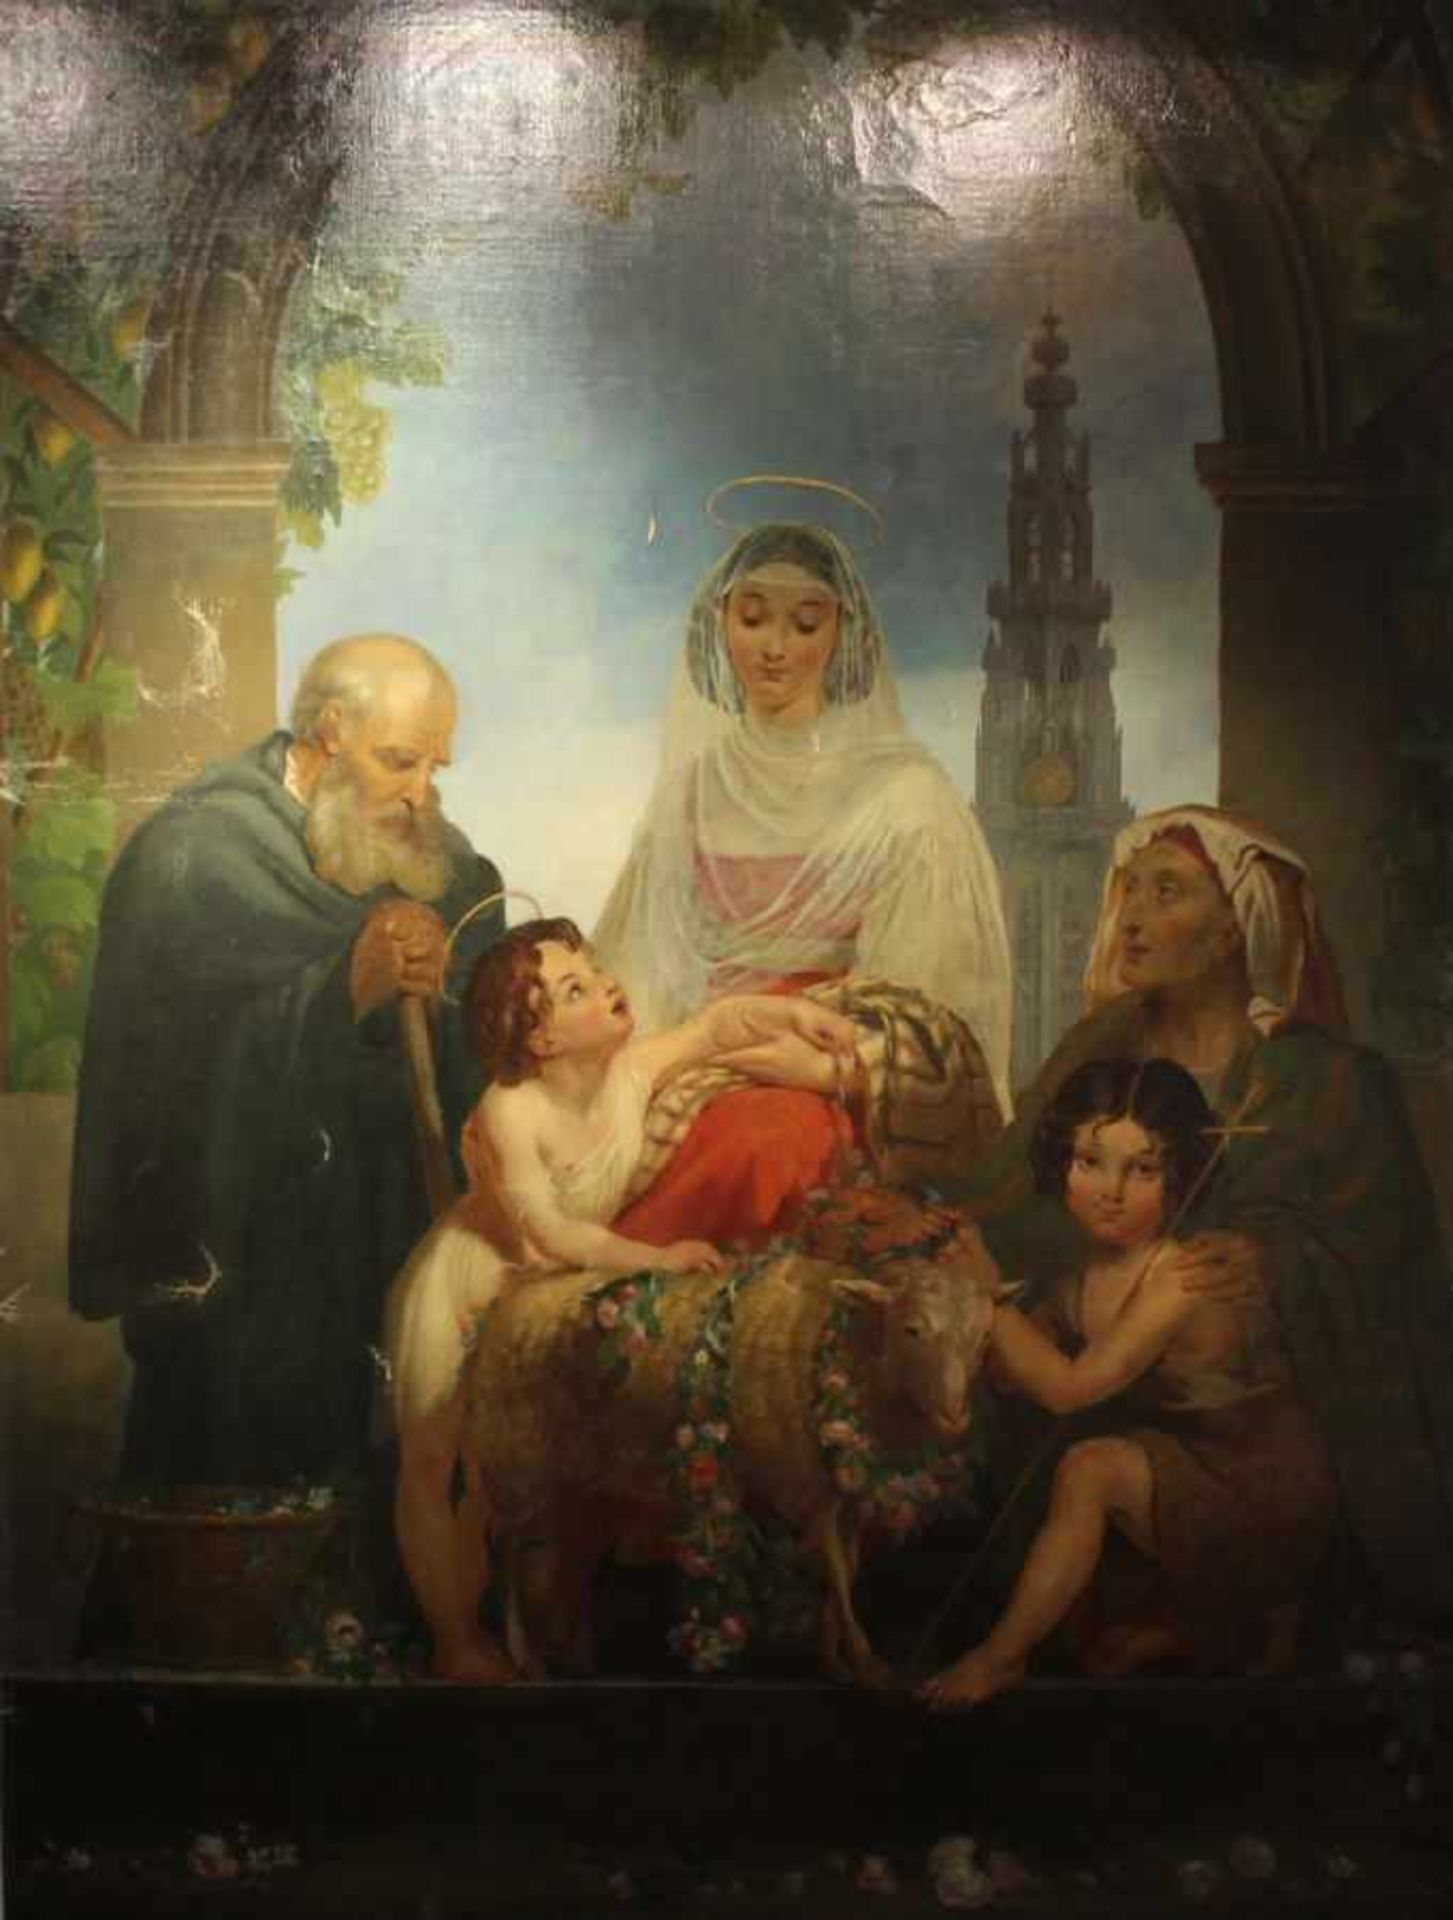 Los 26 - Großes Gemälde - Philippe-Jacques VAN BREE (1786 Antwerpen -1871 Saint-Josse-ten-Noode bei